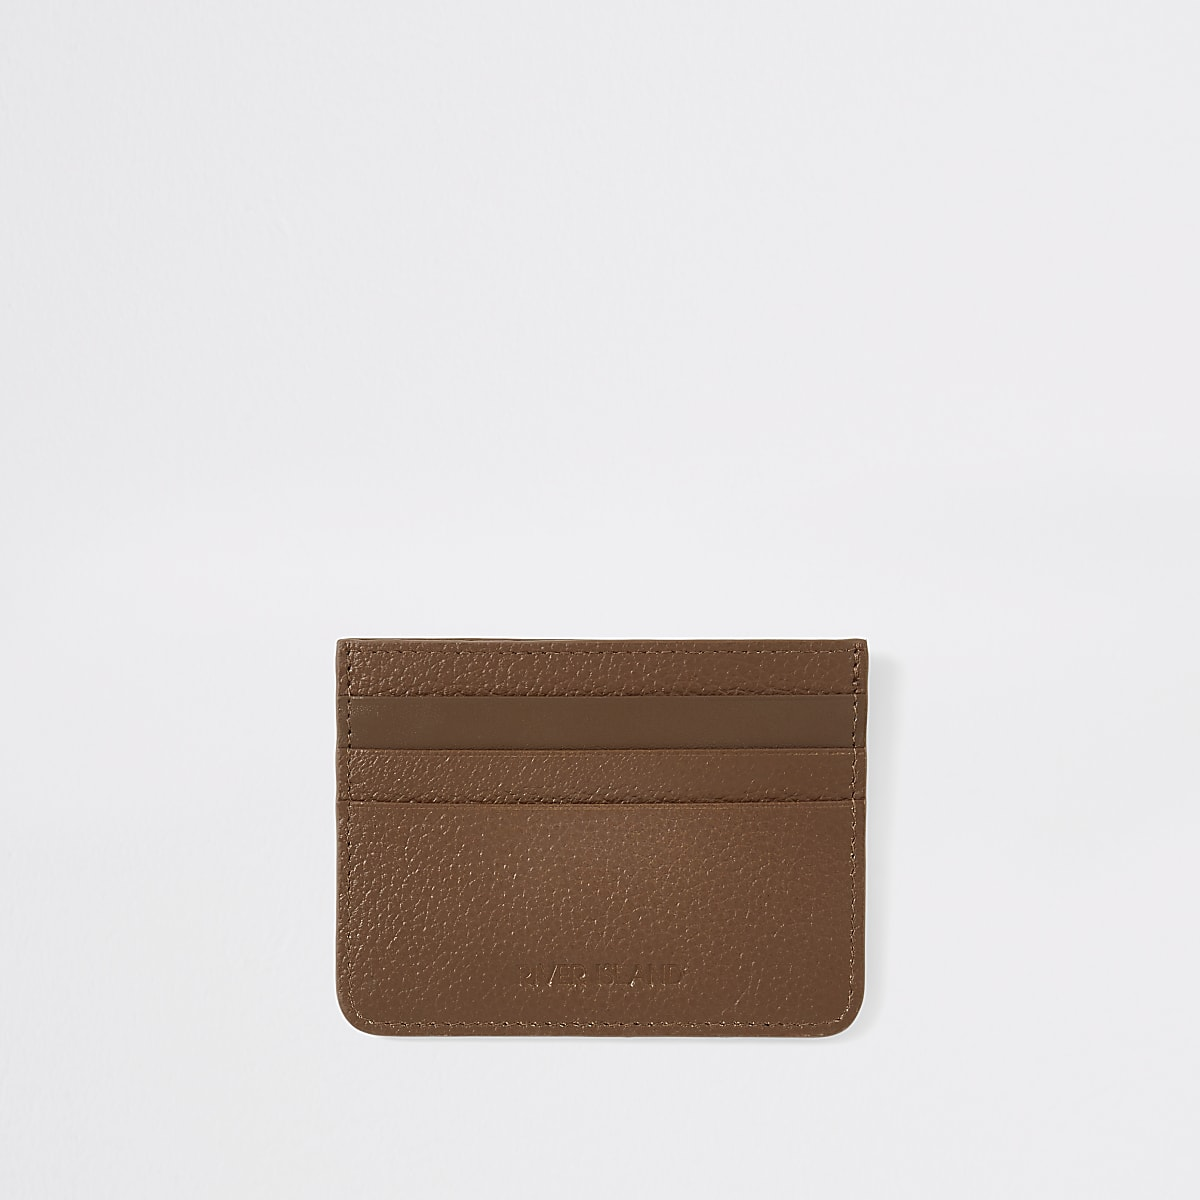 Porte-cartes RI en cuir texturé fauve